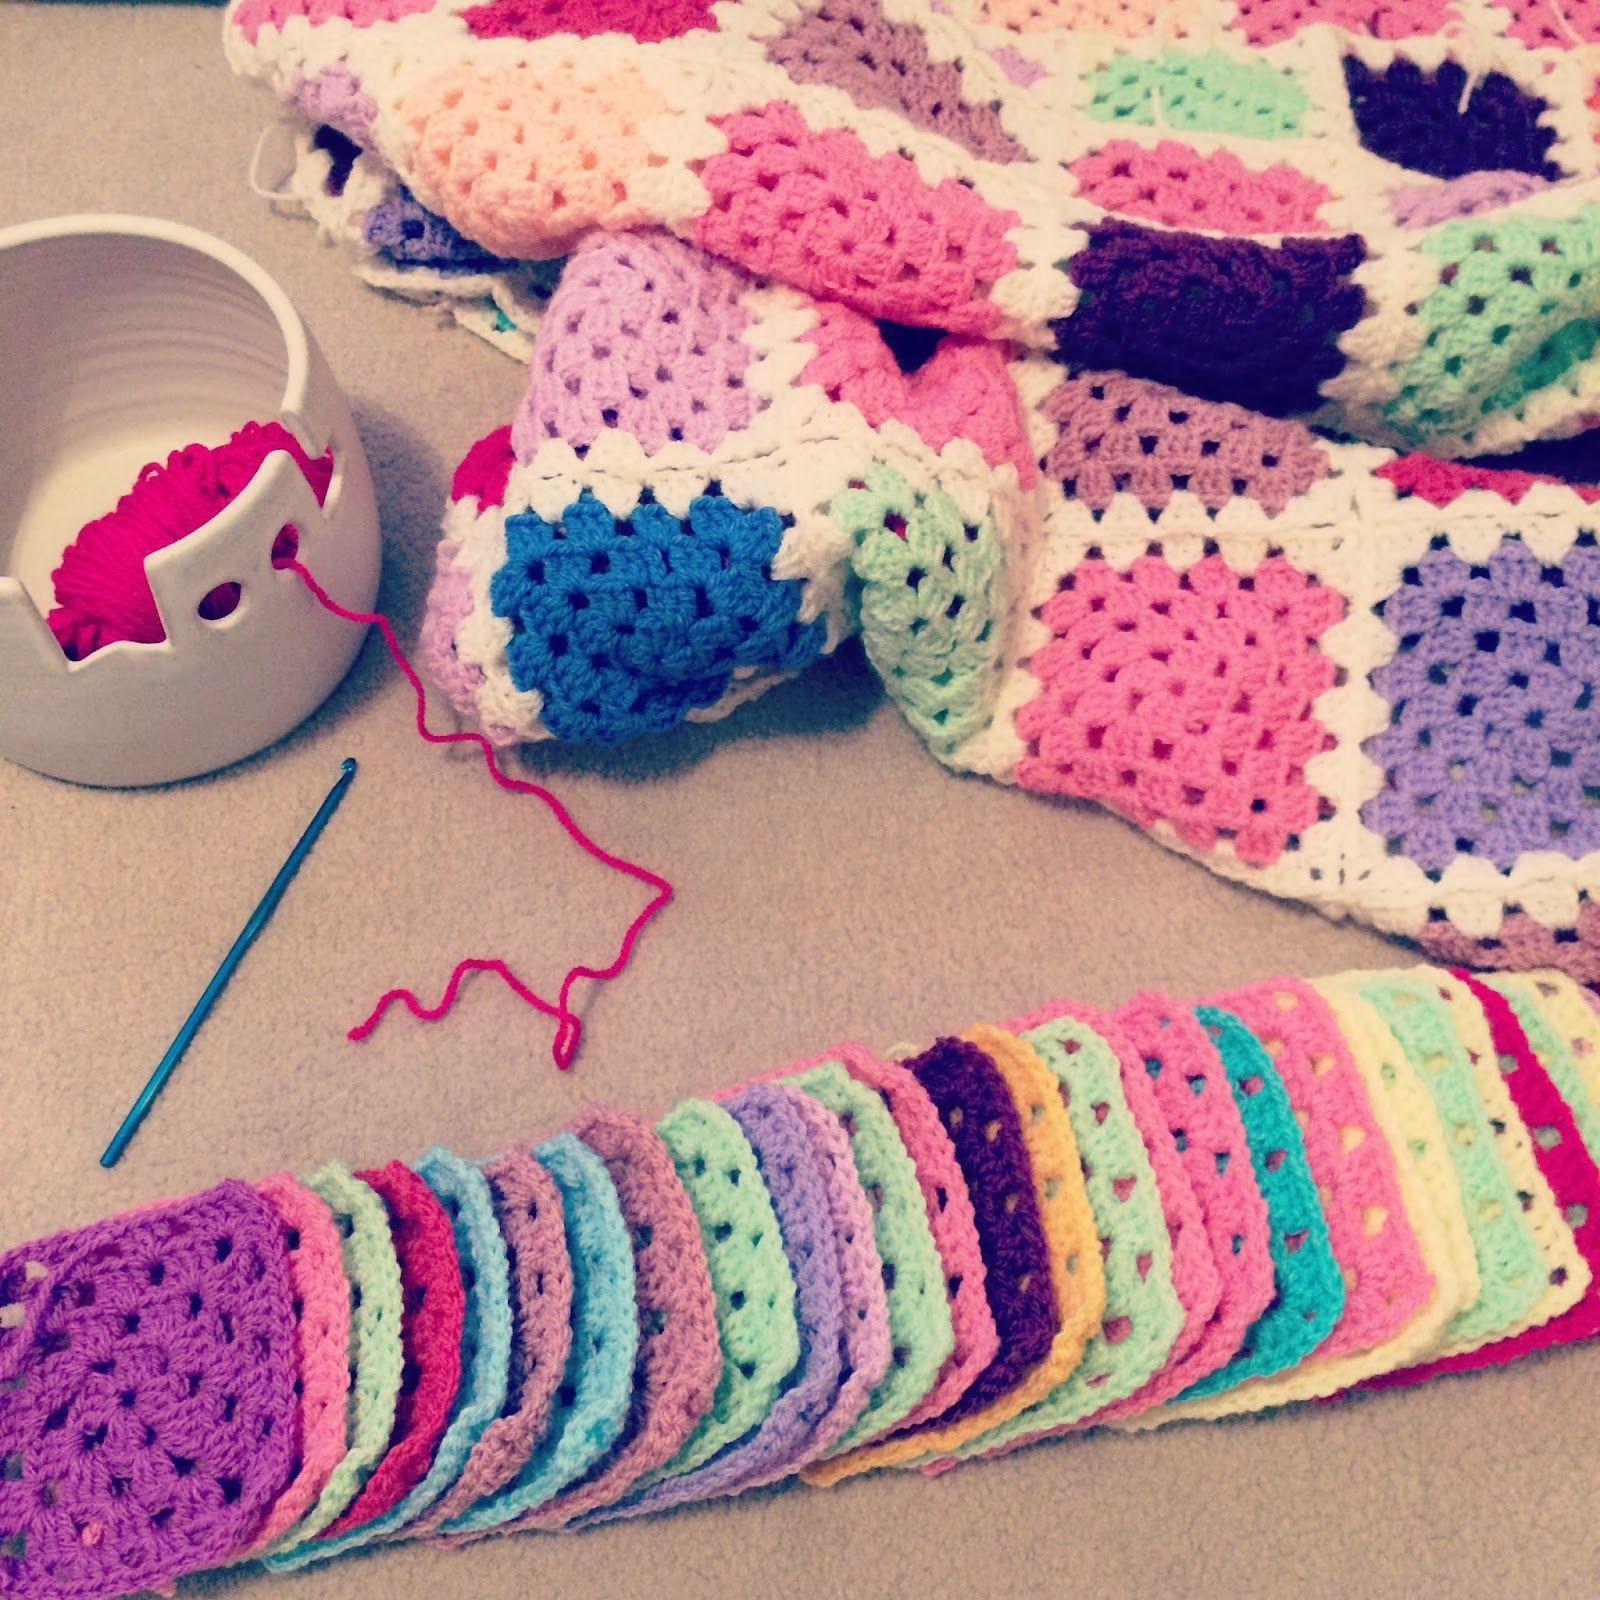 Crochet granny squares, Crochet mood blanket 2014 | Bella ...